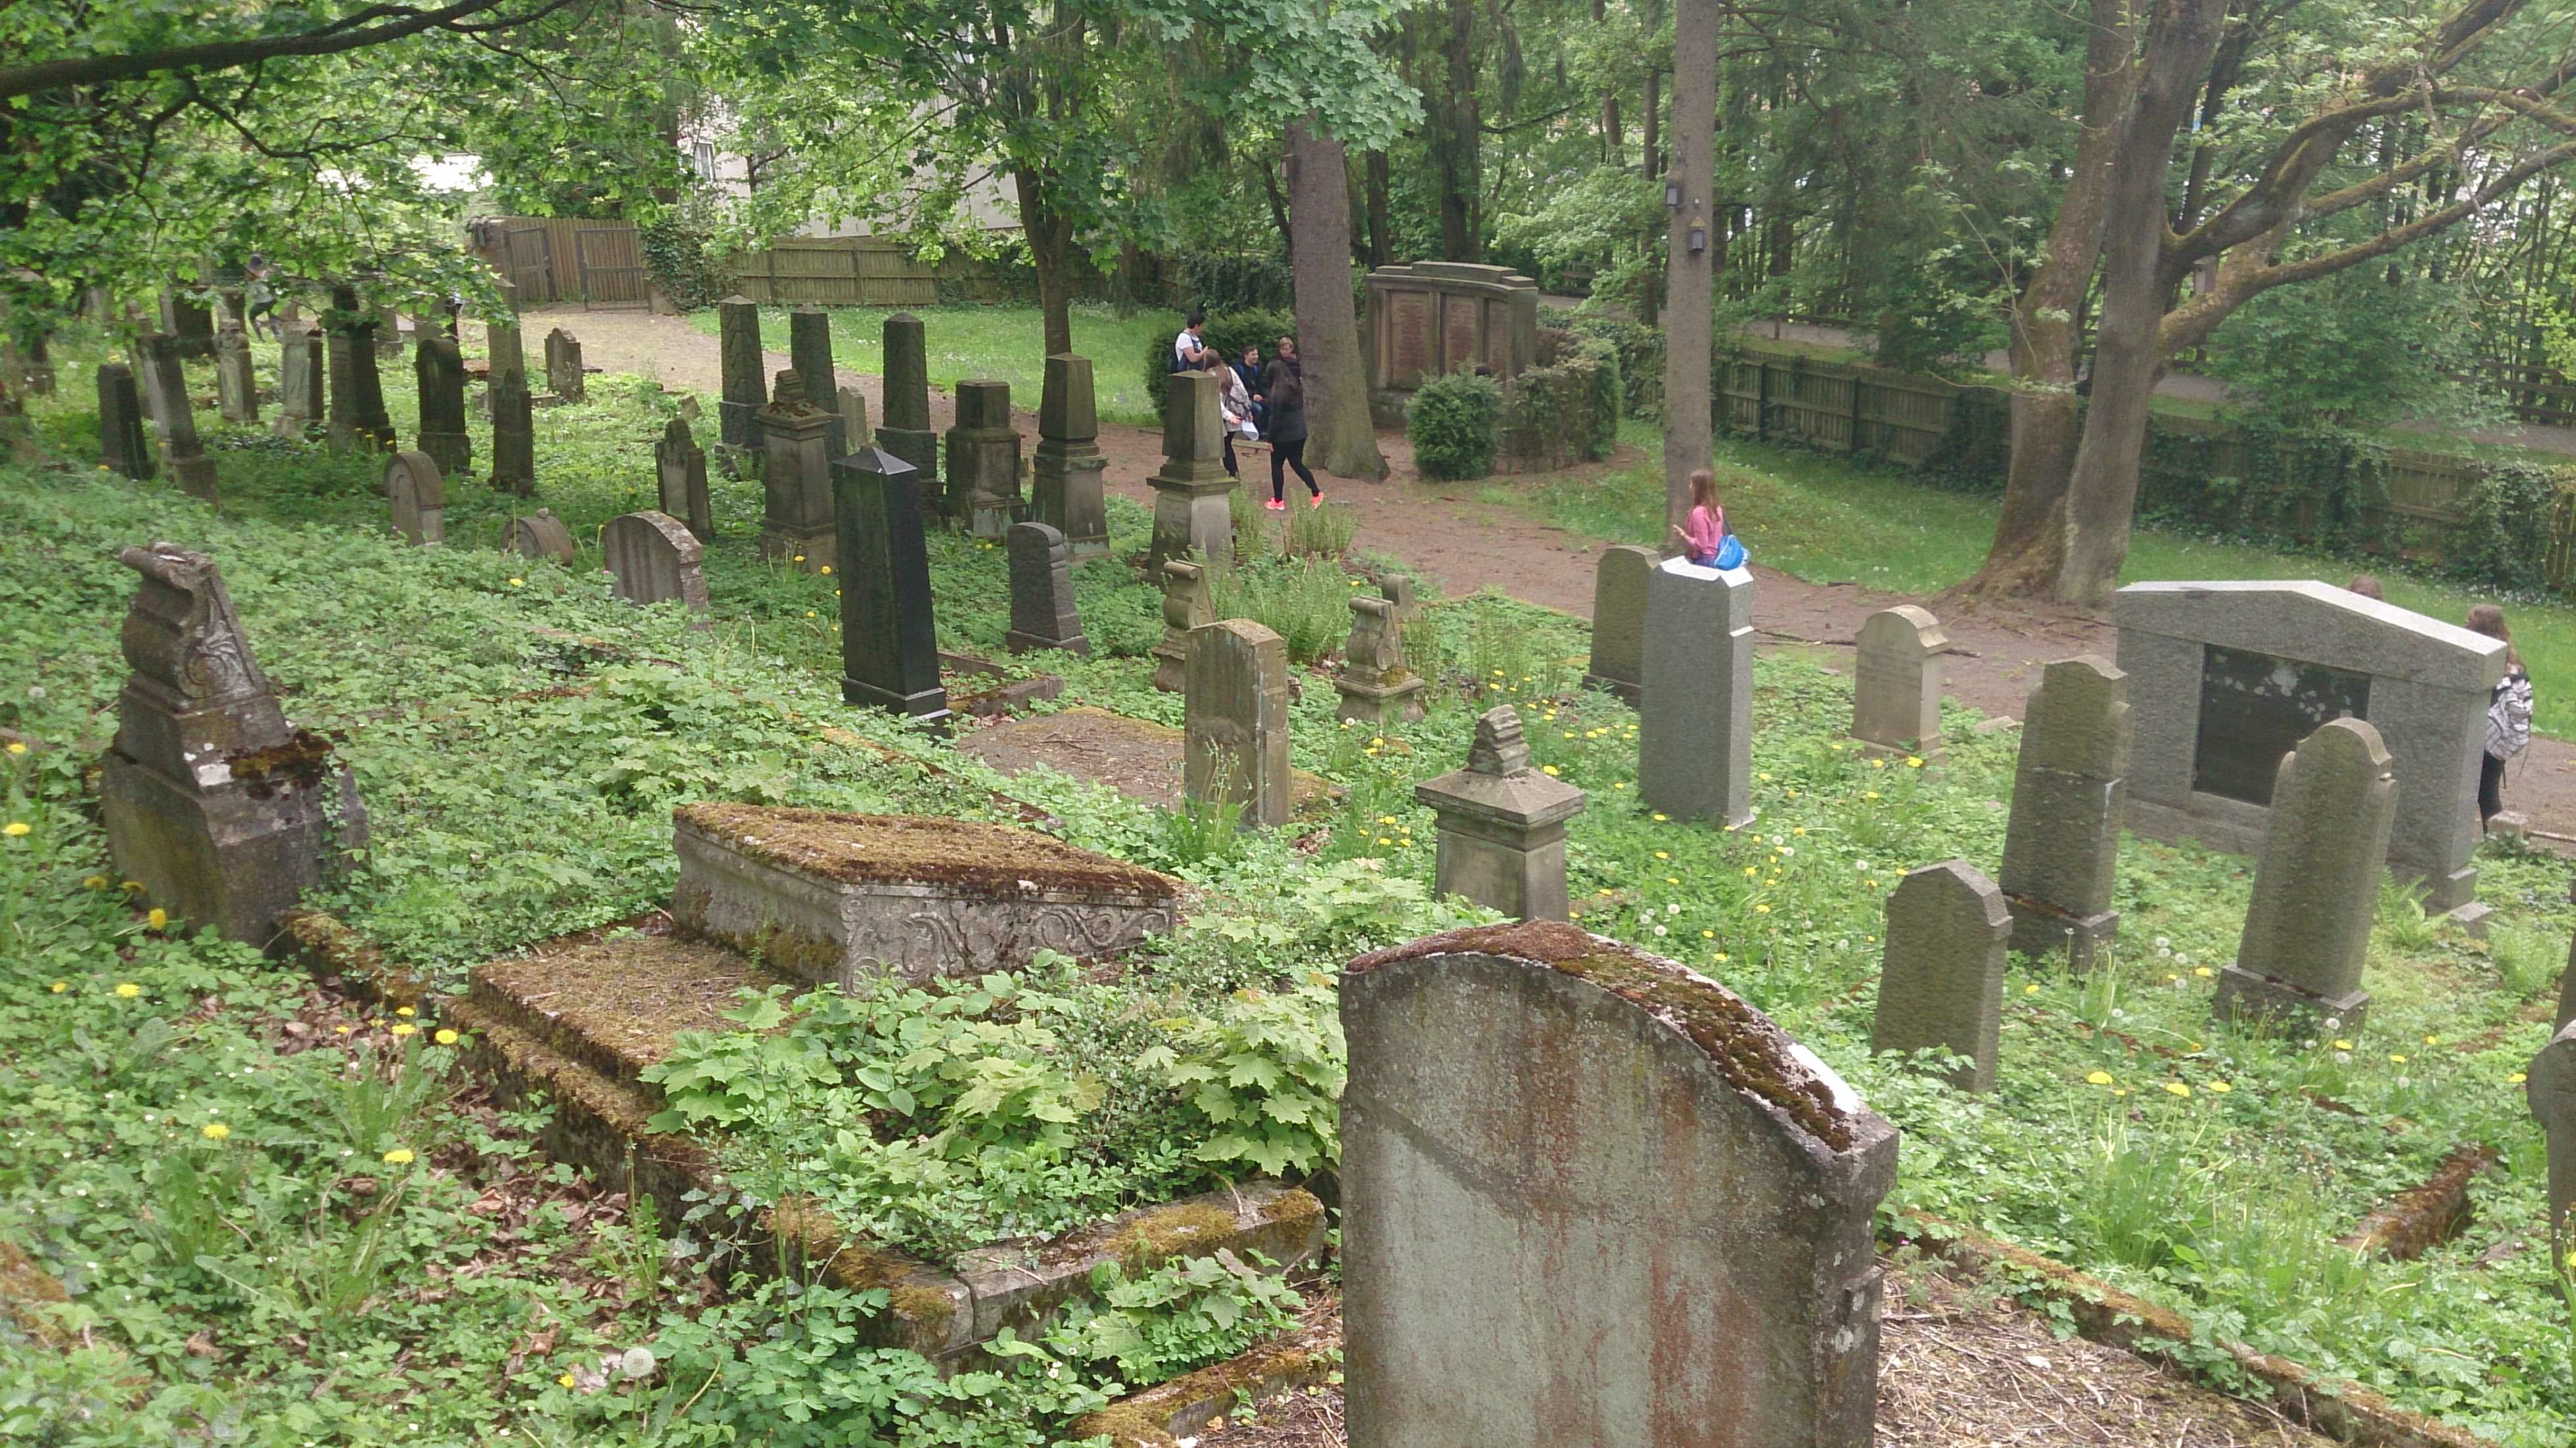 http://korbach-youth.de/wp-content/uploads/2015/05/j%C3%BCdischerfriedhof1_mini.jpg